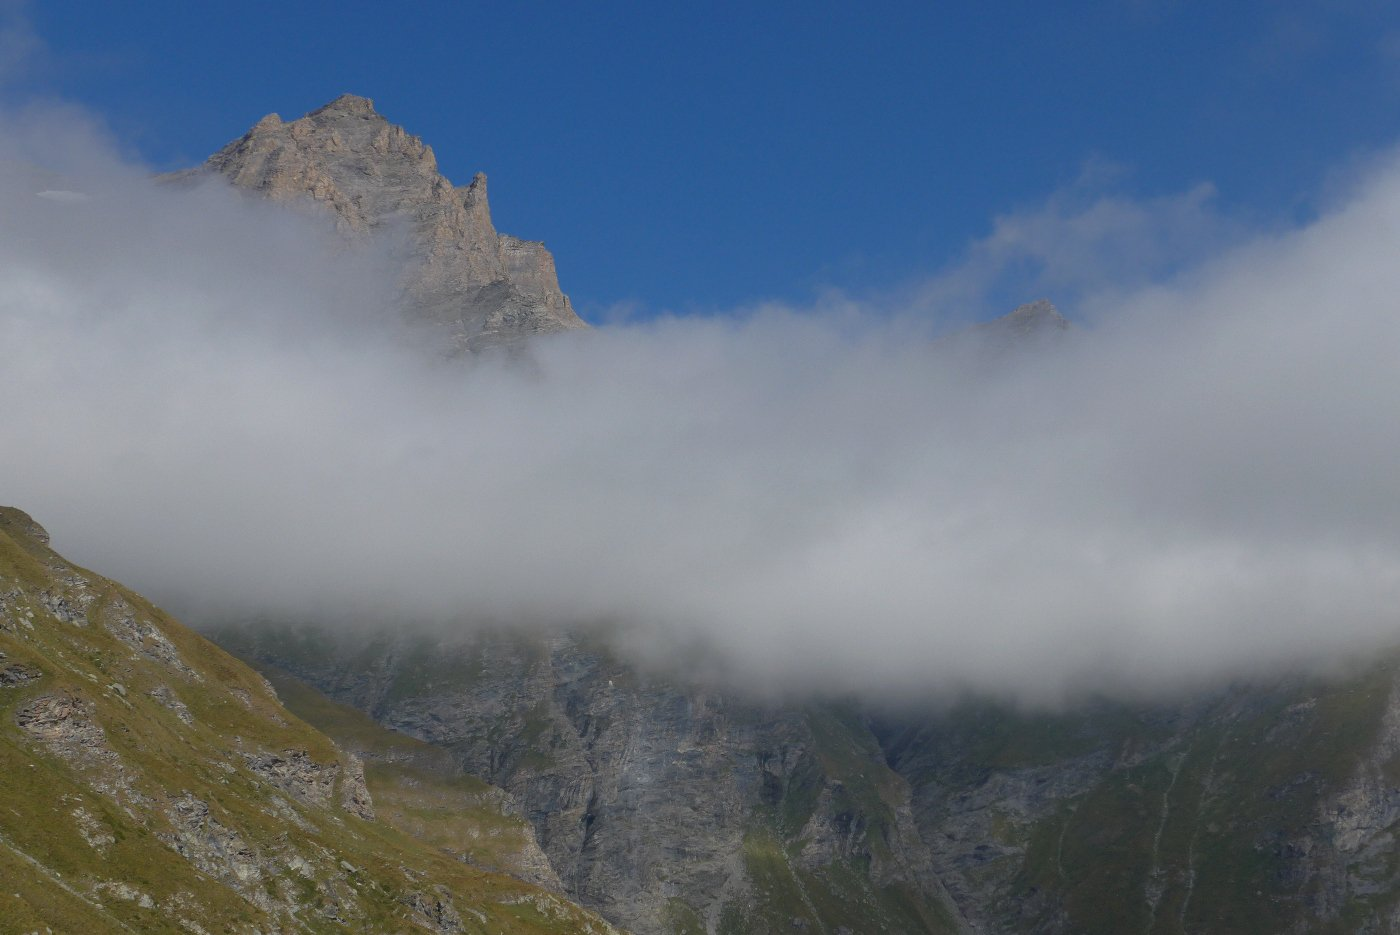 La punta del Fort sopra le nuvole